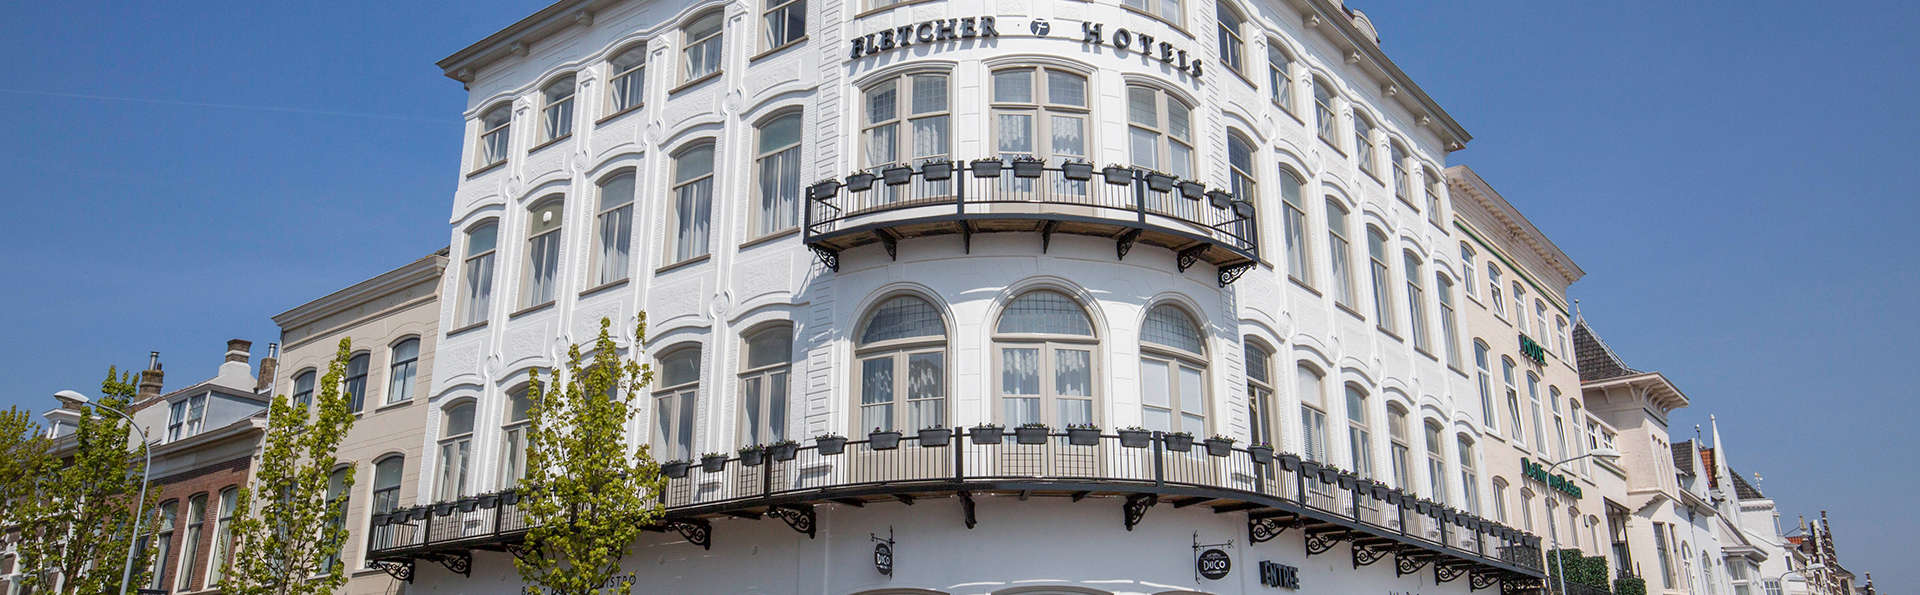 Fletcher Hotel-Restaurant Middelburg - EDIT_front.jpg